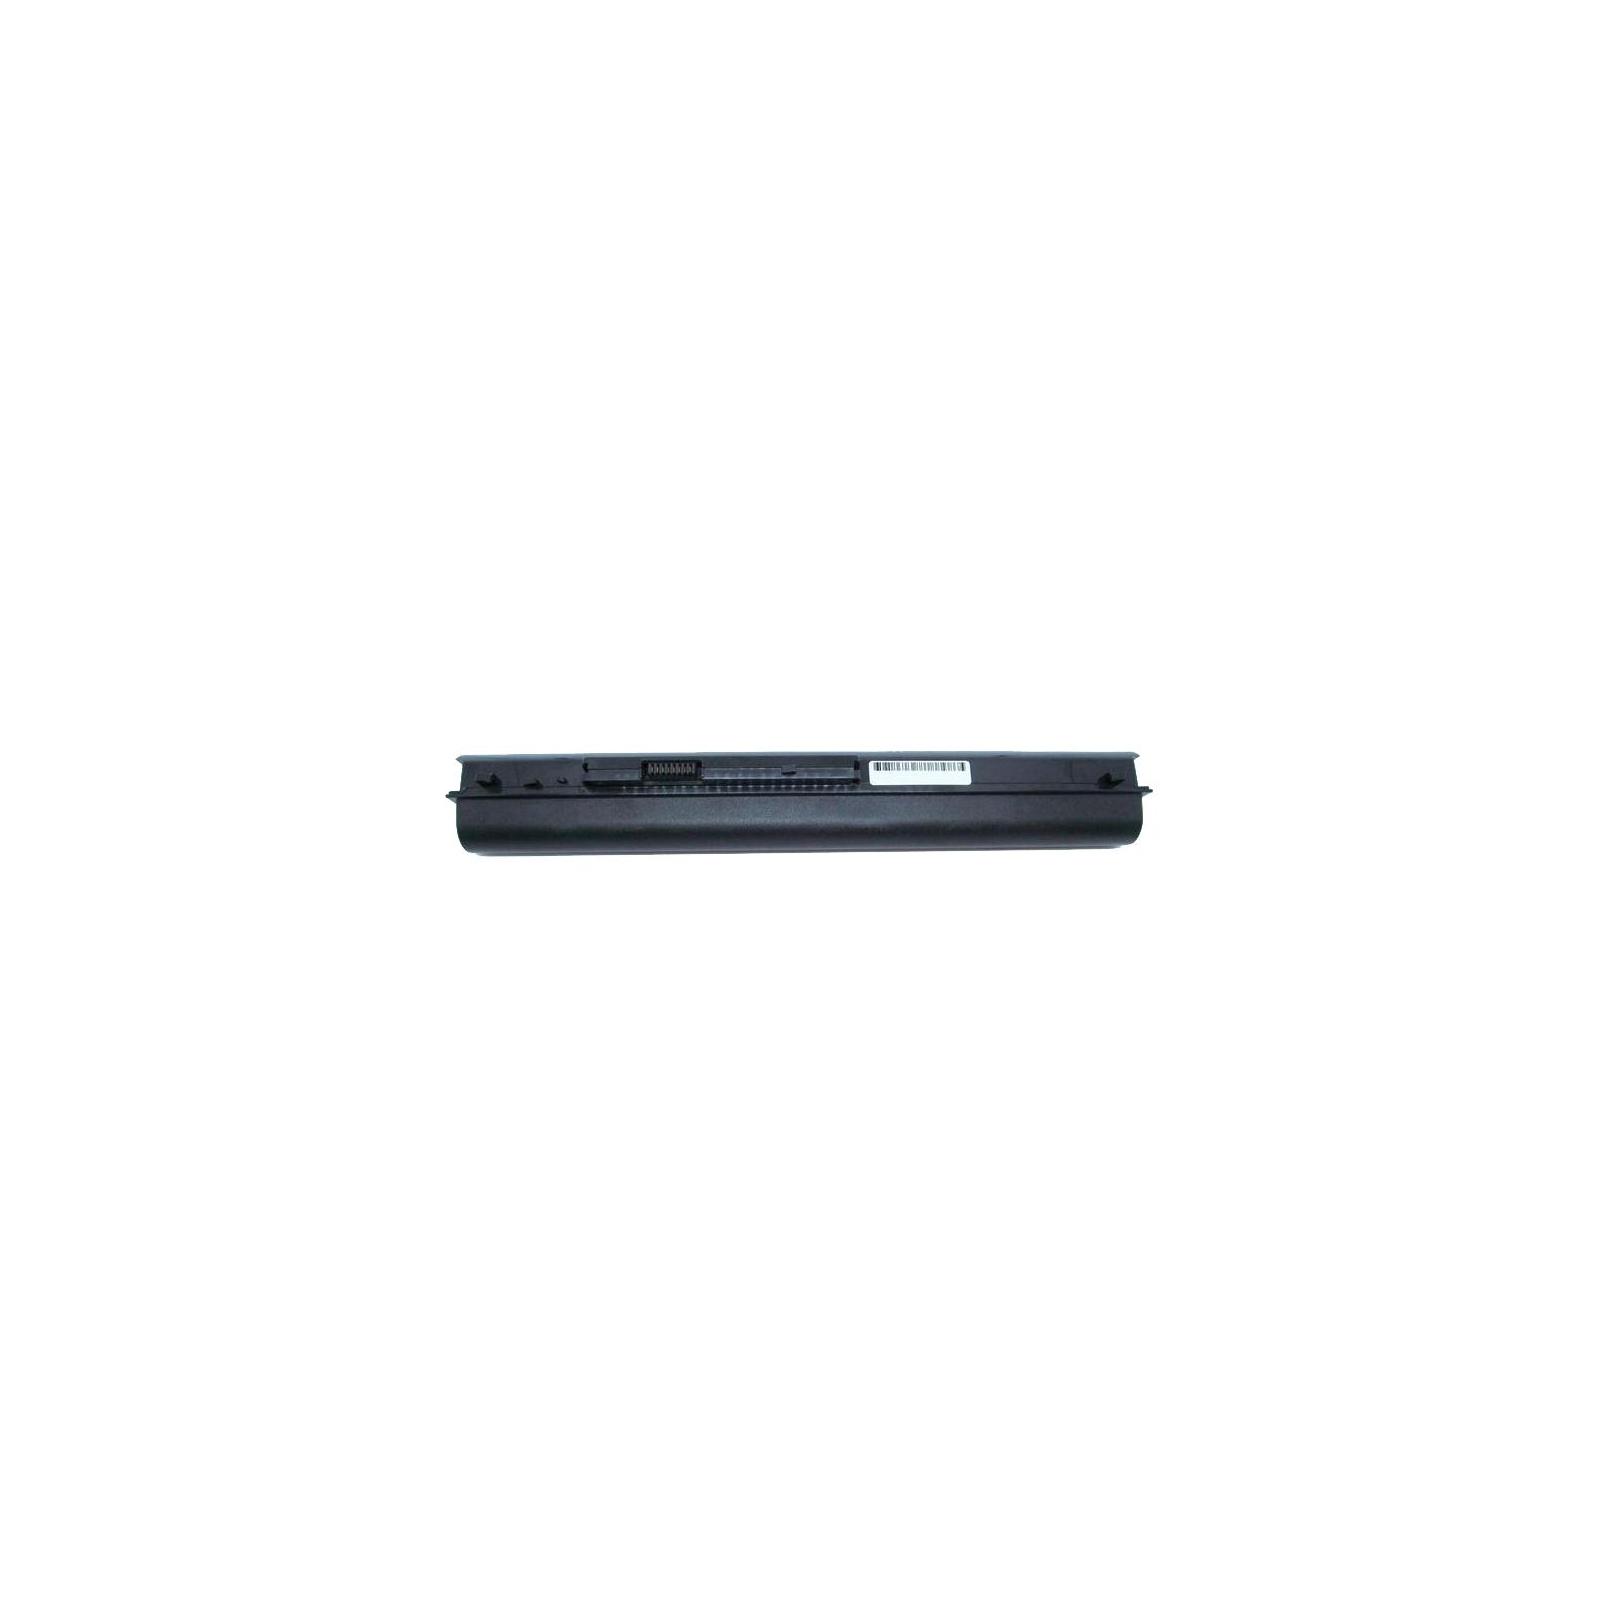 Аккумулятор для ноутбука HP 240 G2 HSTNN-LB5S, 5200mAh, 8cell, 14.8V, Li-ion (A47239)